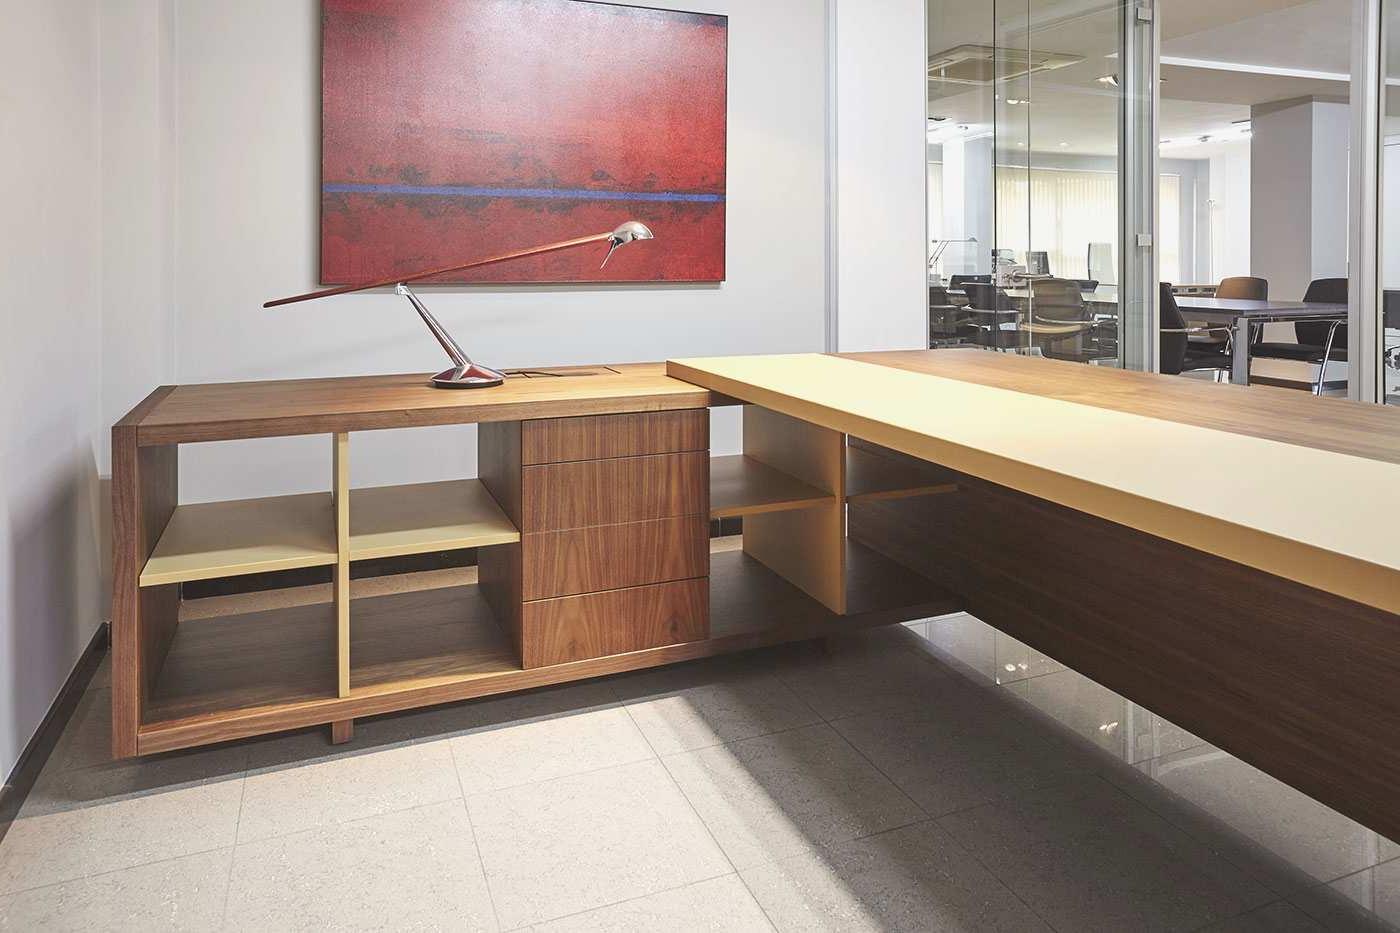 Muebles Oficina Valencia Kvdd Impresionante Showroom Valencia Muebles De Oficina Sillas Y Muebles